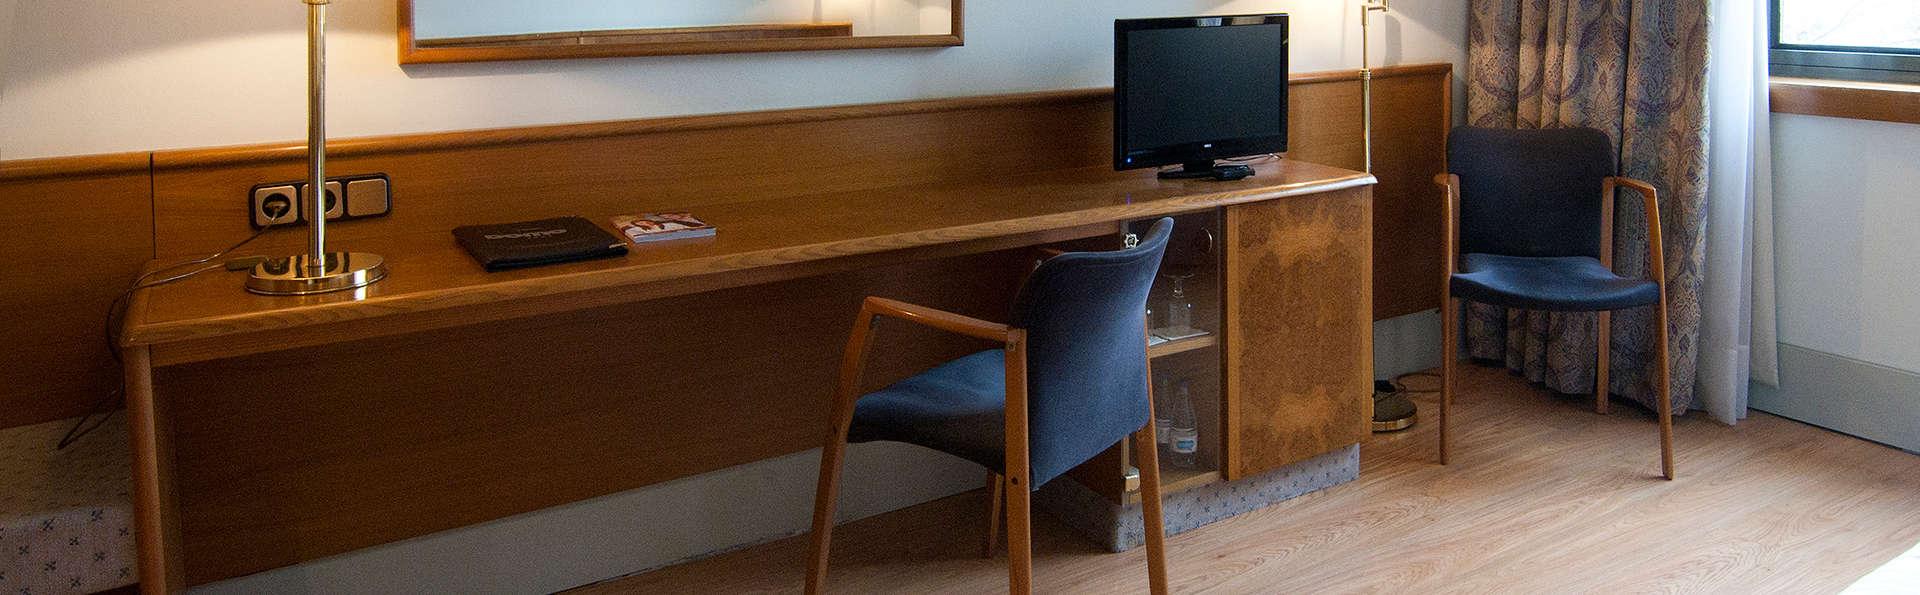 Hotel Domo - EDIT_room2.jpg